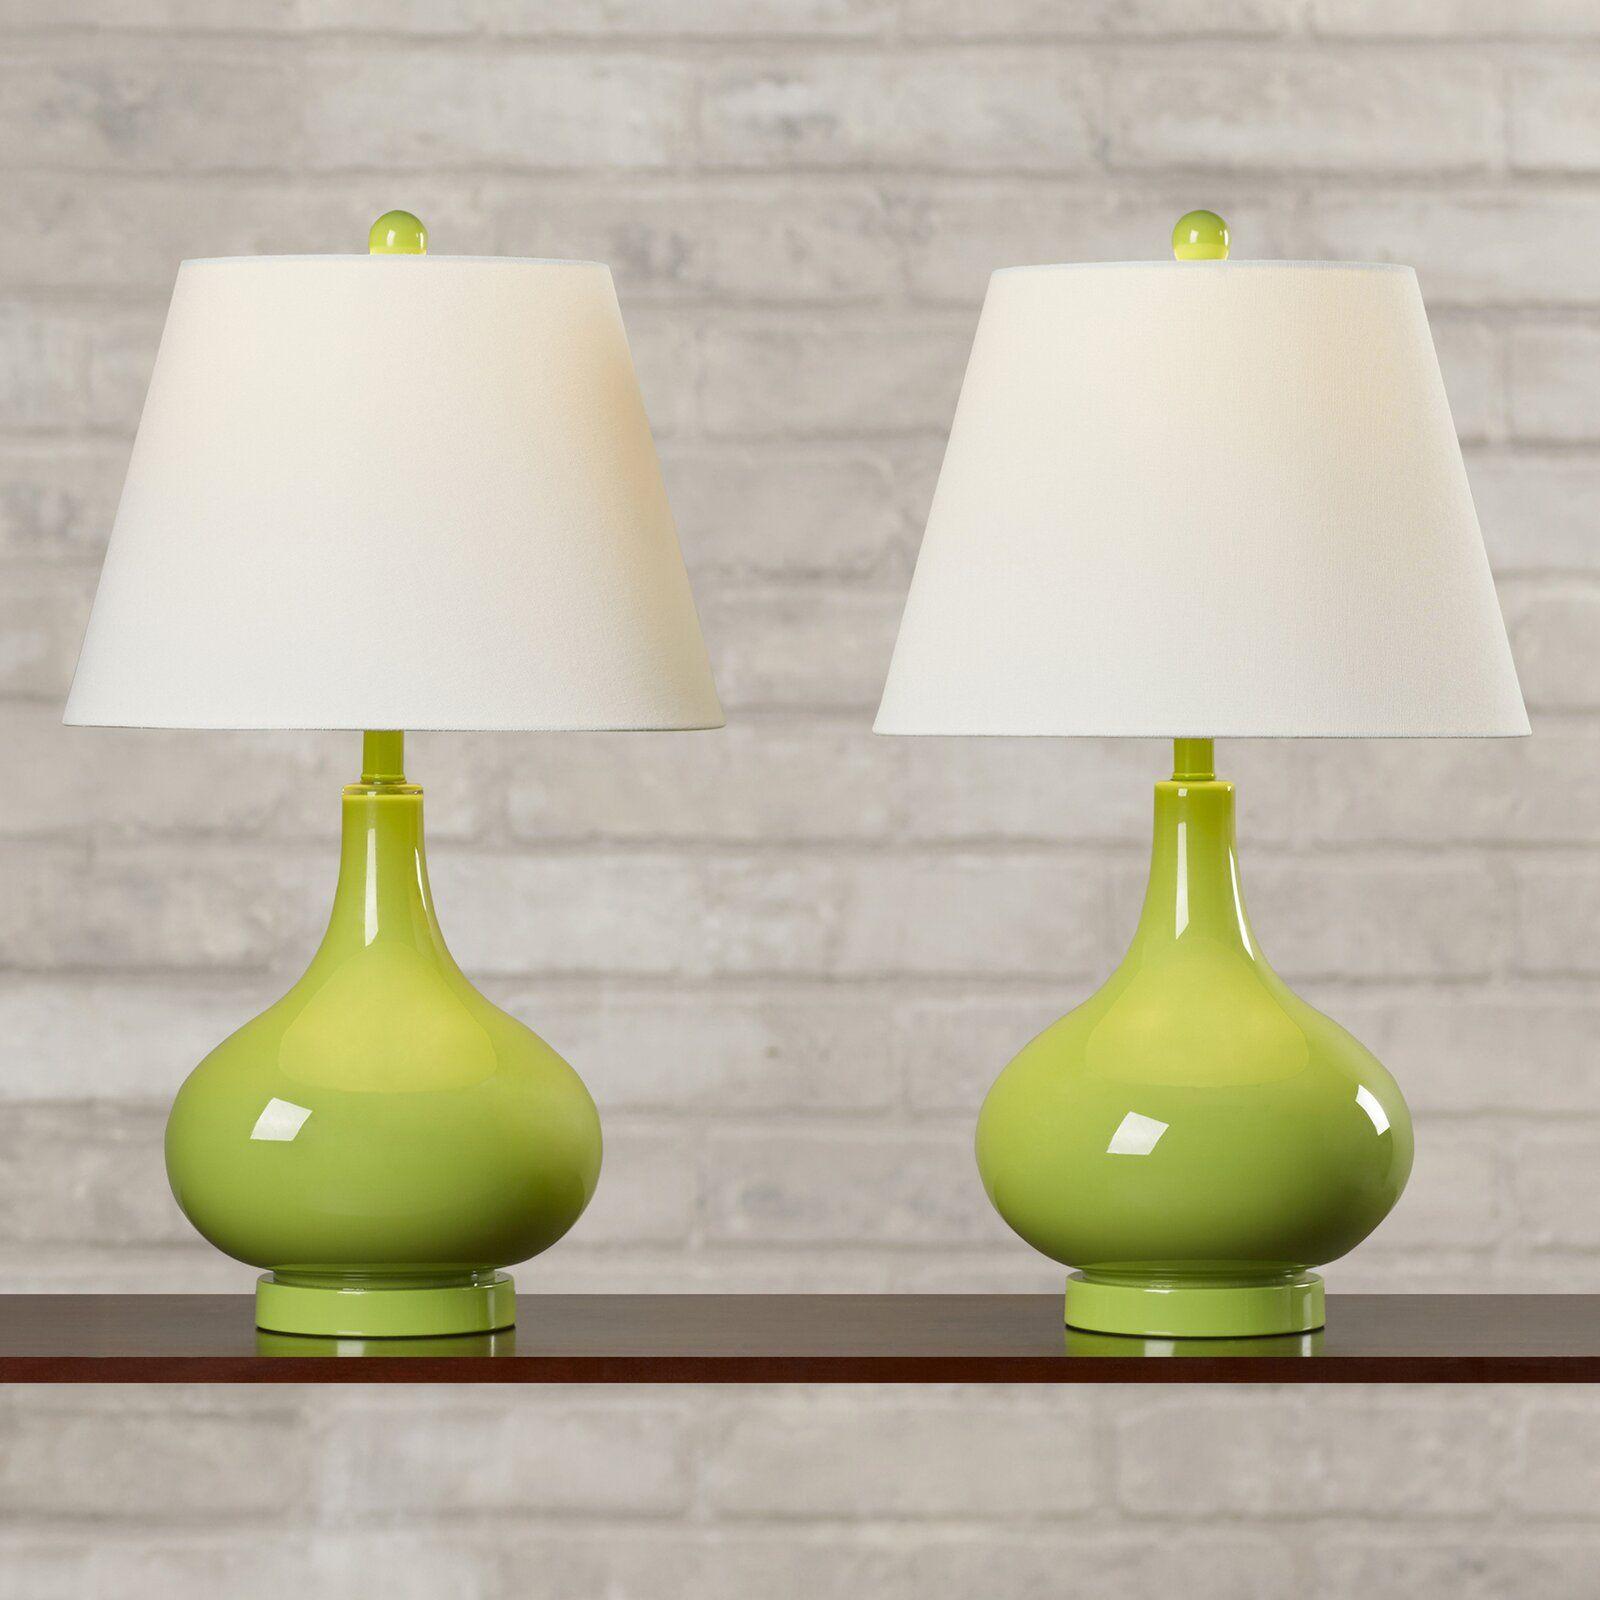 Bridger 24 Table Lamp Set Table Lamp Table Lamp Sets Lamp Sets